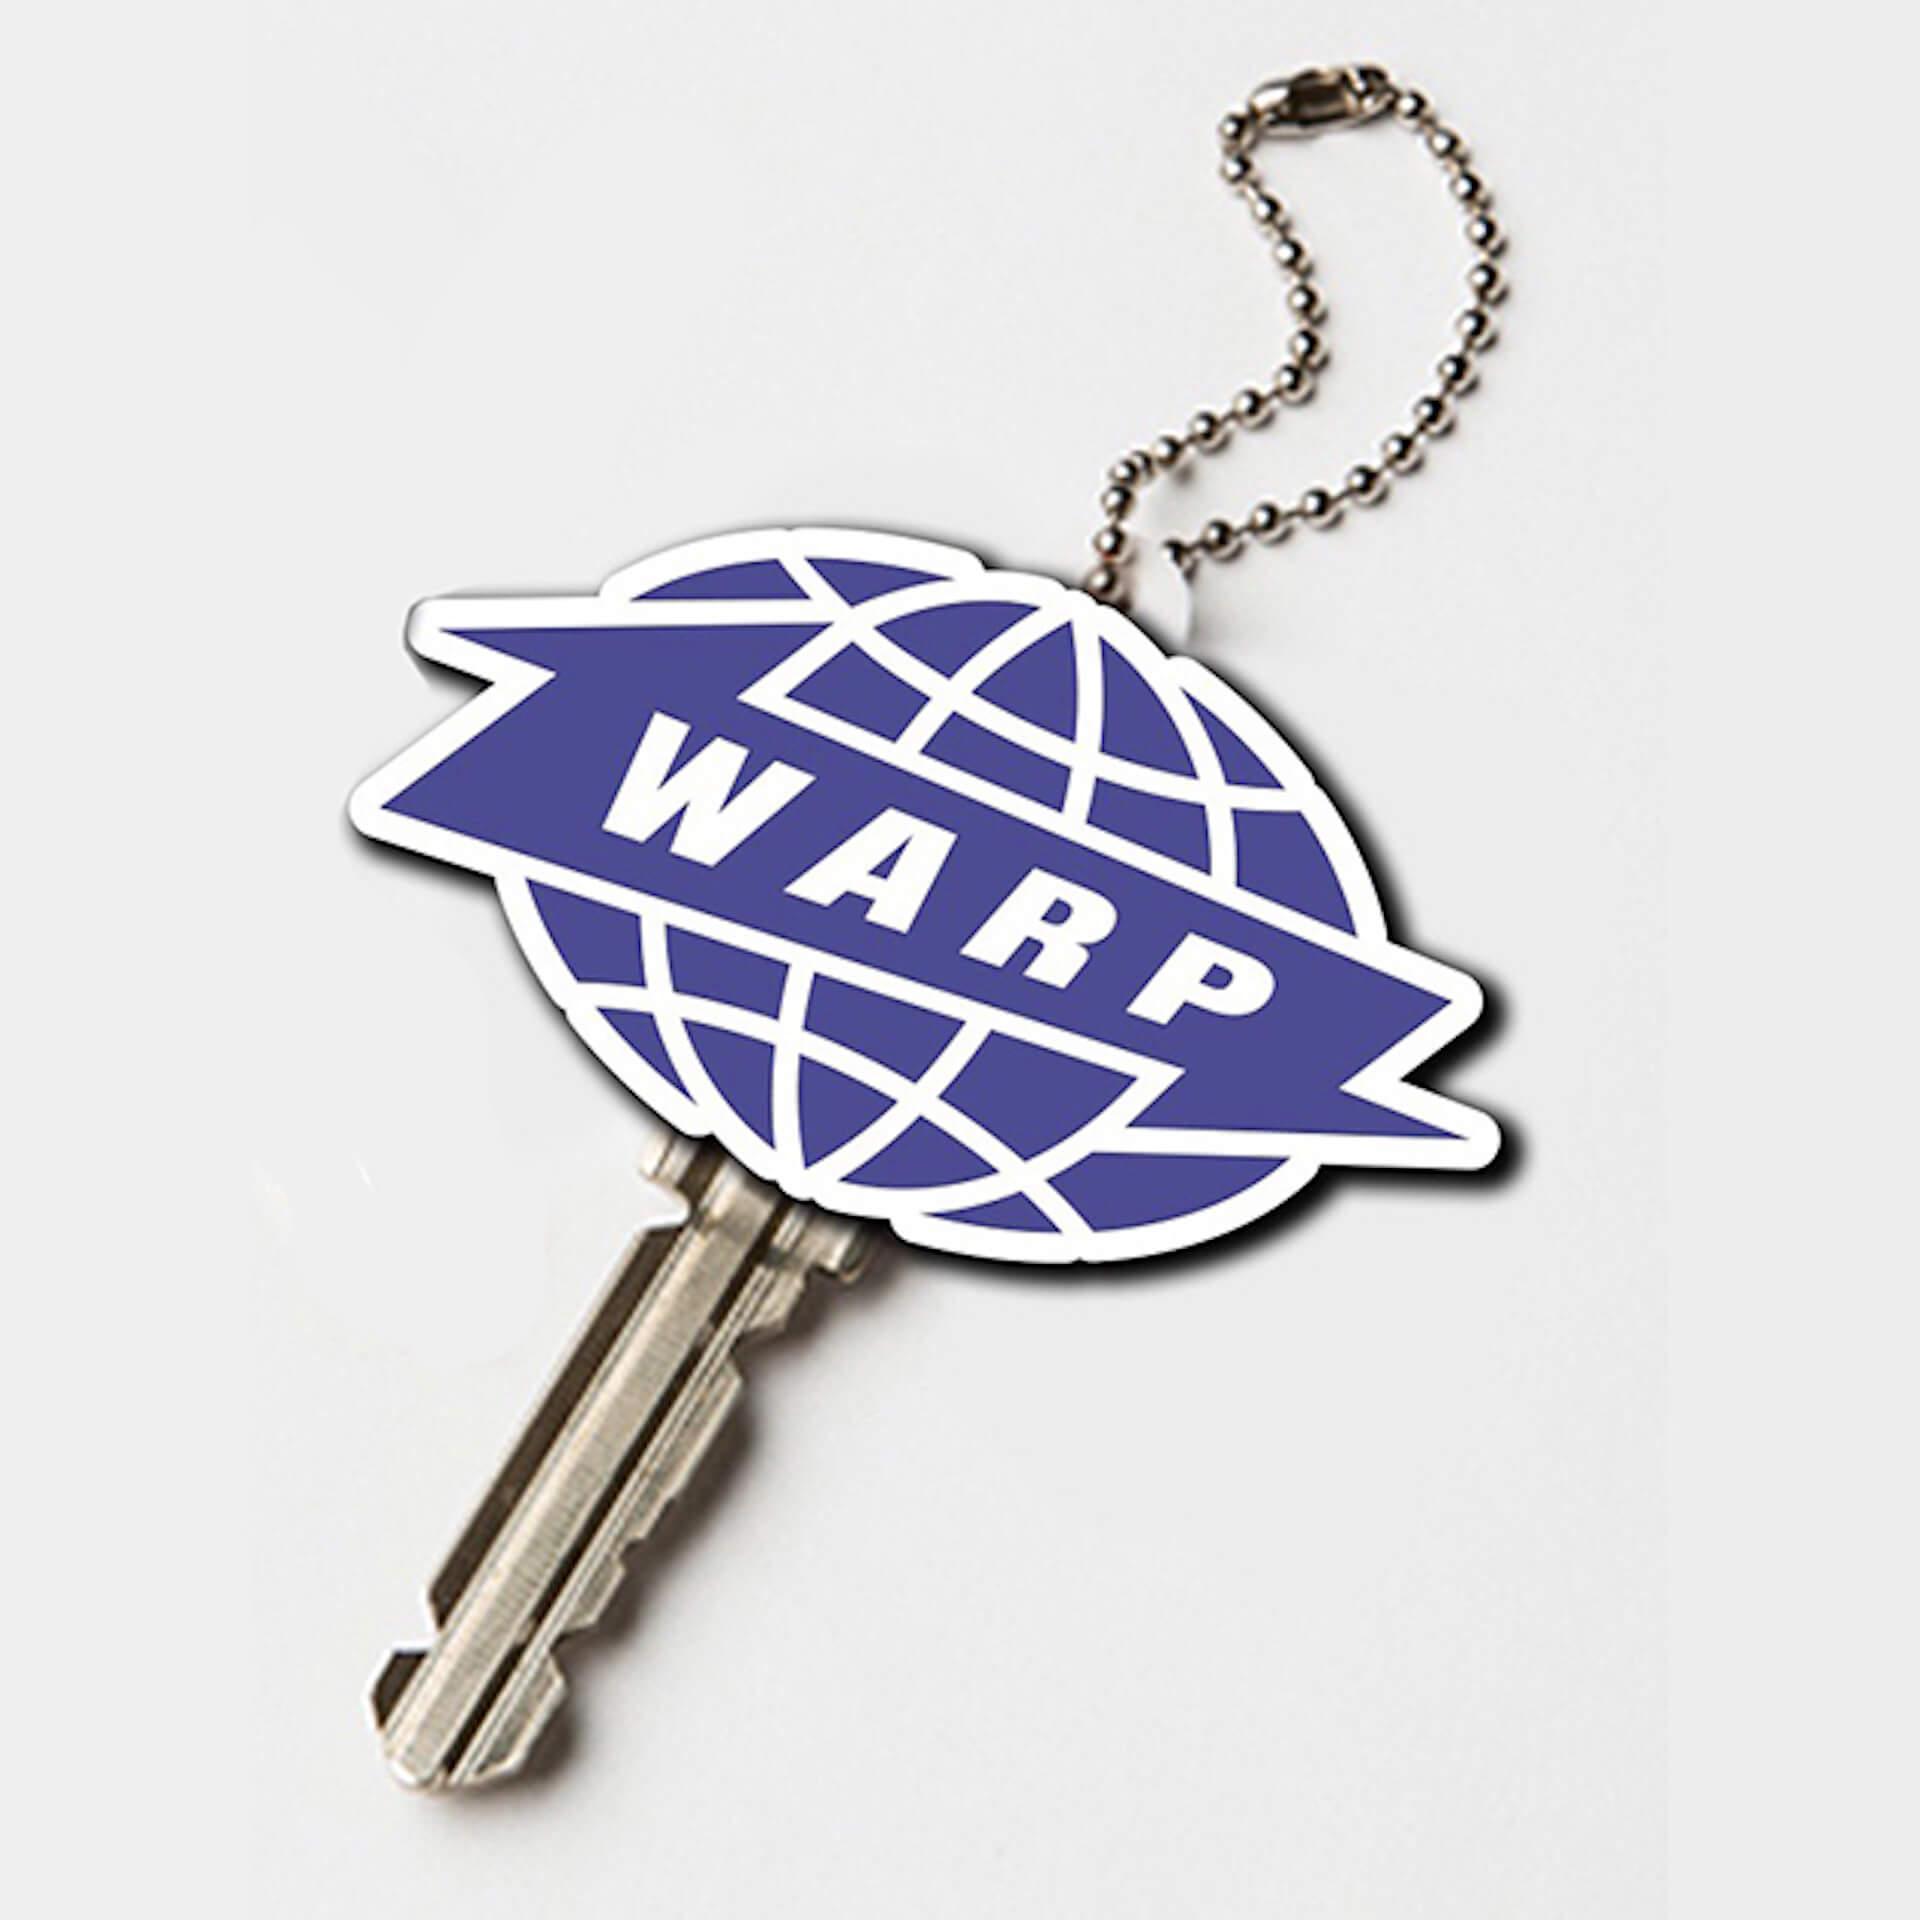 <WARP RECORDS>30周年記念作品『WXAXRXP SESSIONS』が本日リリース|<WXAXRXP>ポップアップが伊勢丹メンズ館にて開催も music_191115_warprecords_4